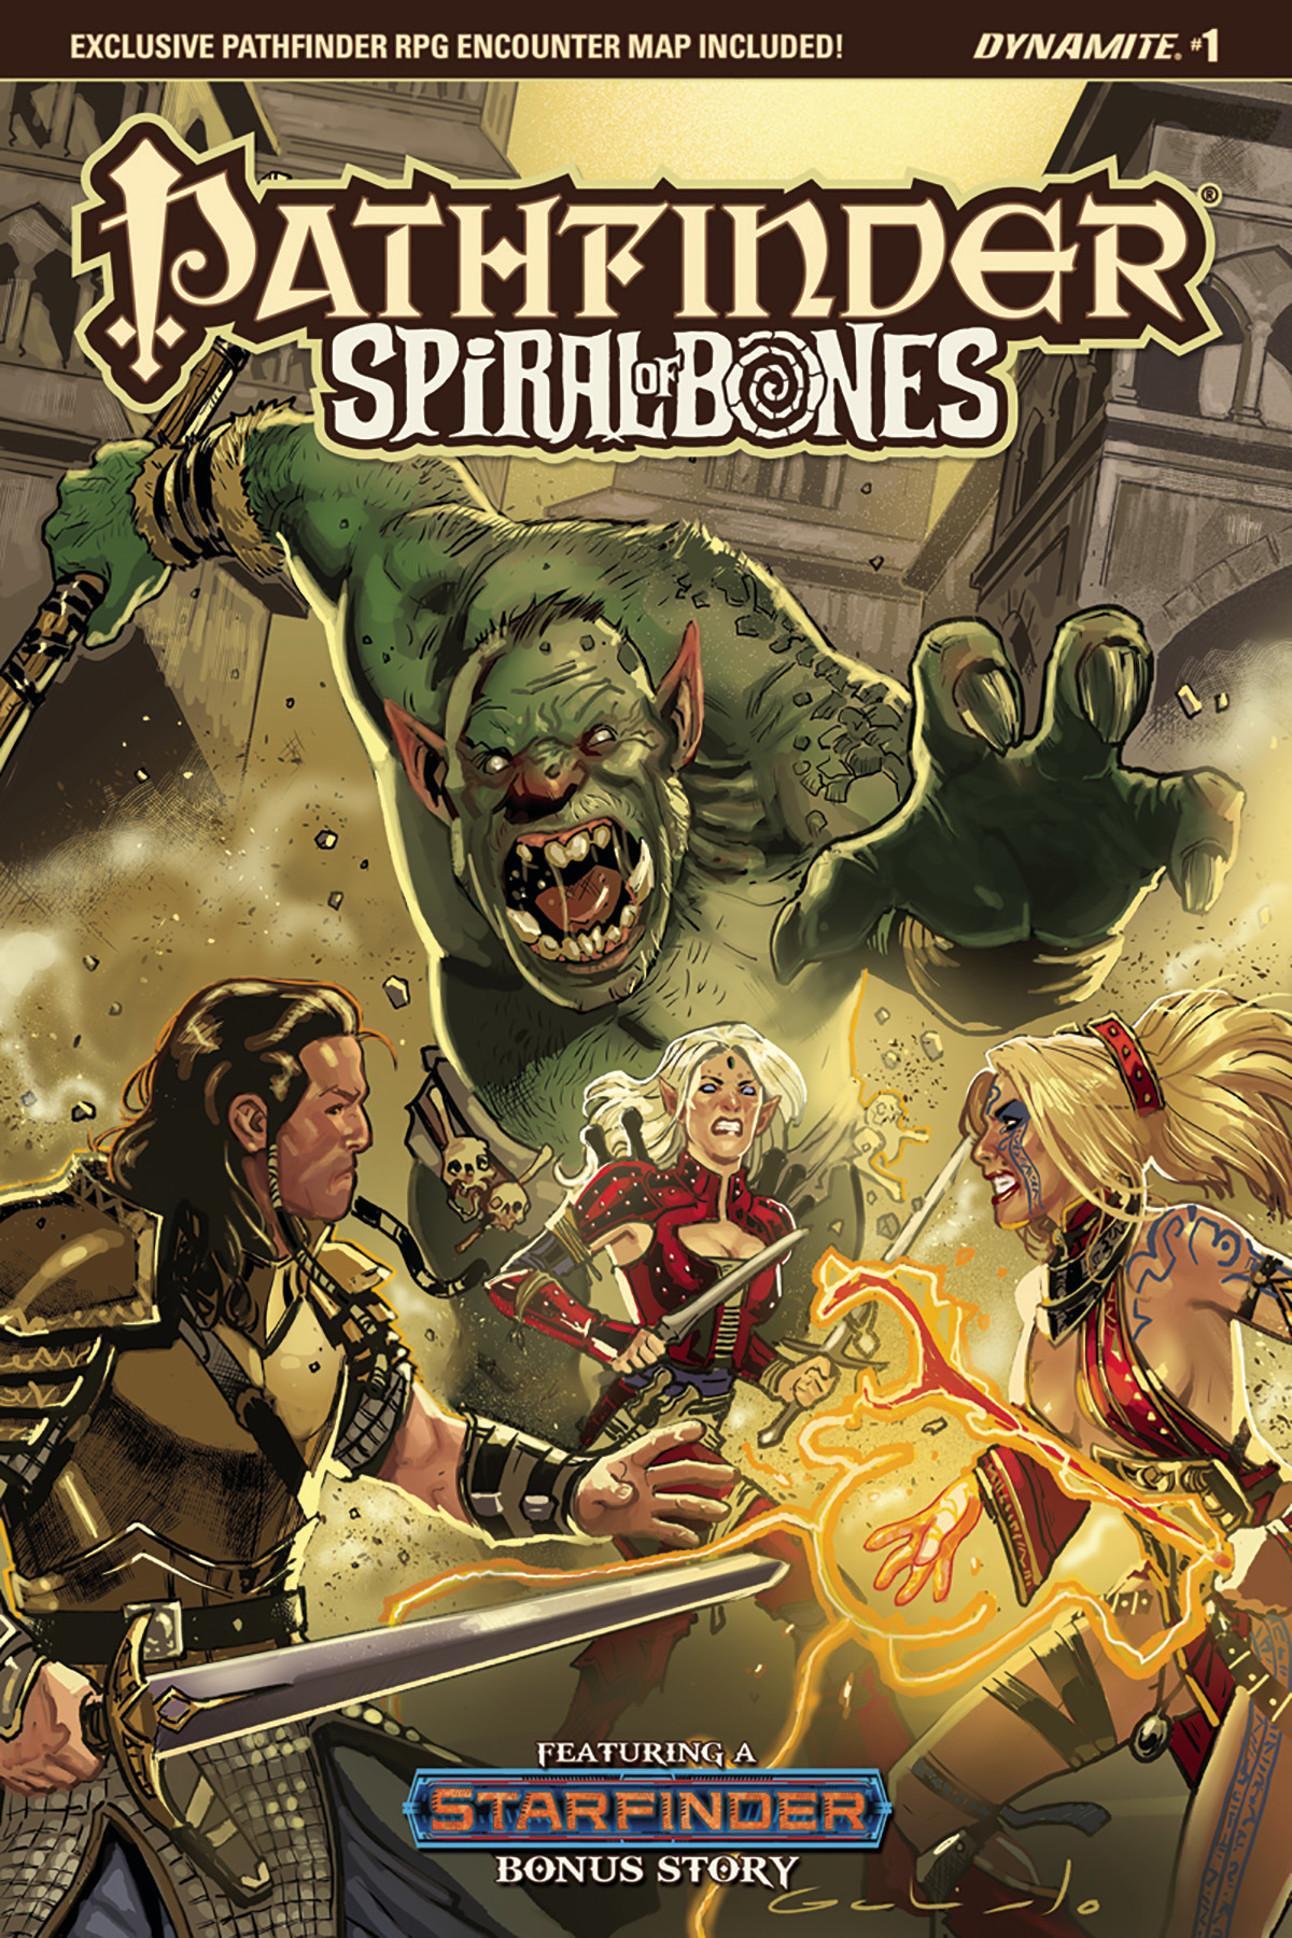 dynamite_pathfinder_spiral_of_bones_1_cover.jpg